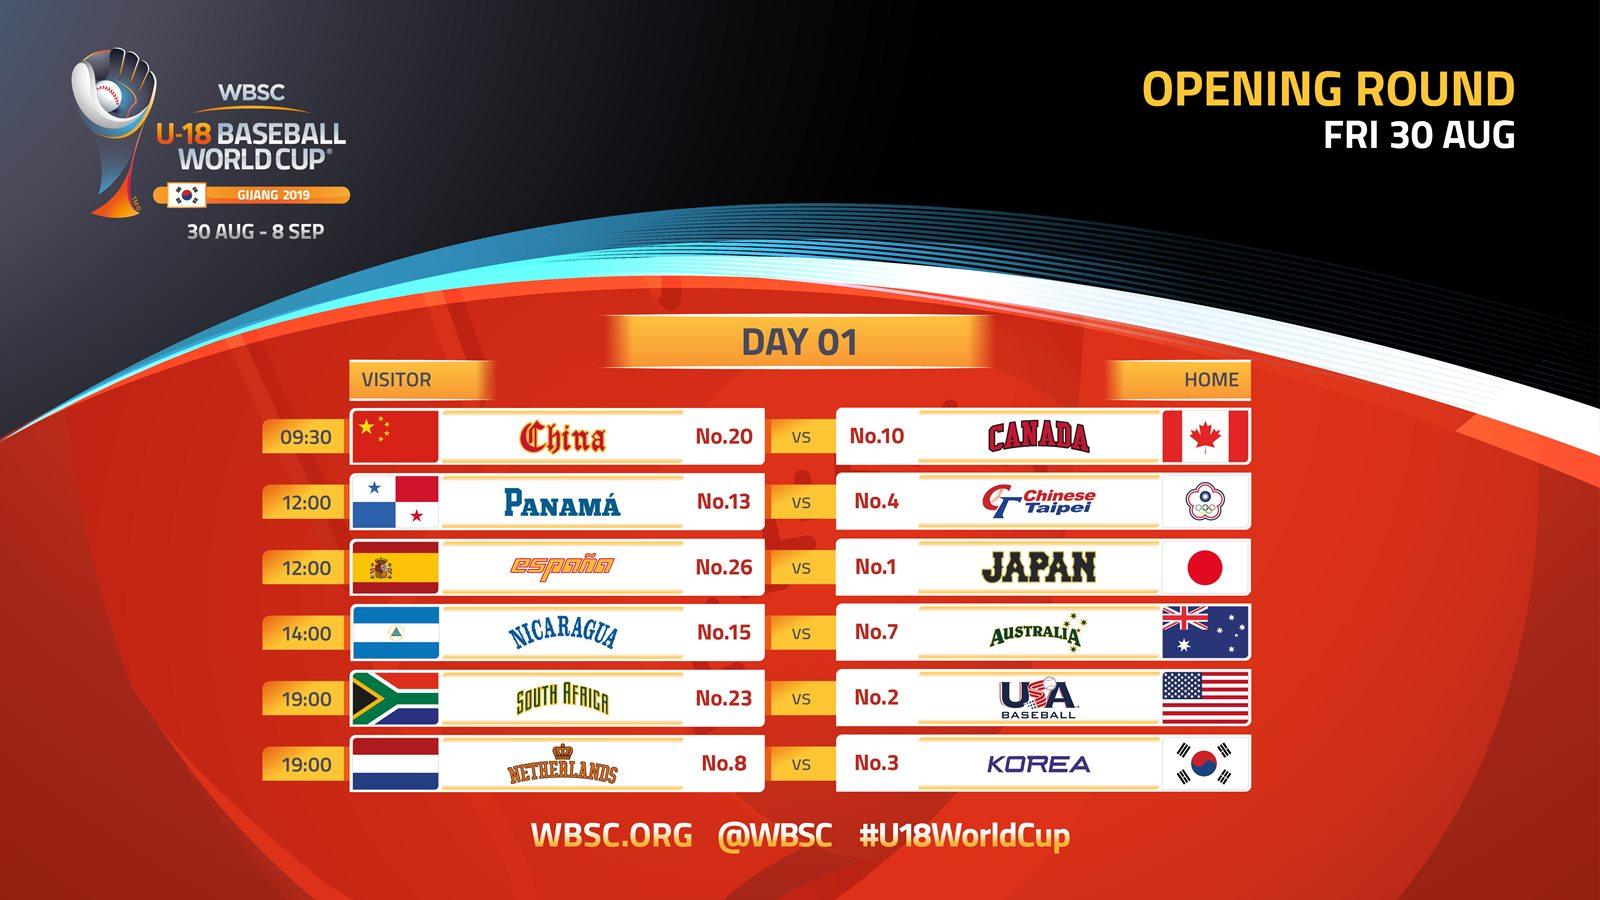 Game Schedule World Cup 2020.Wbsc World Baseball Softball Confederation